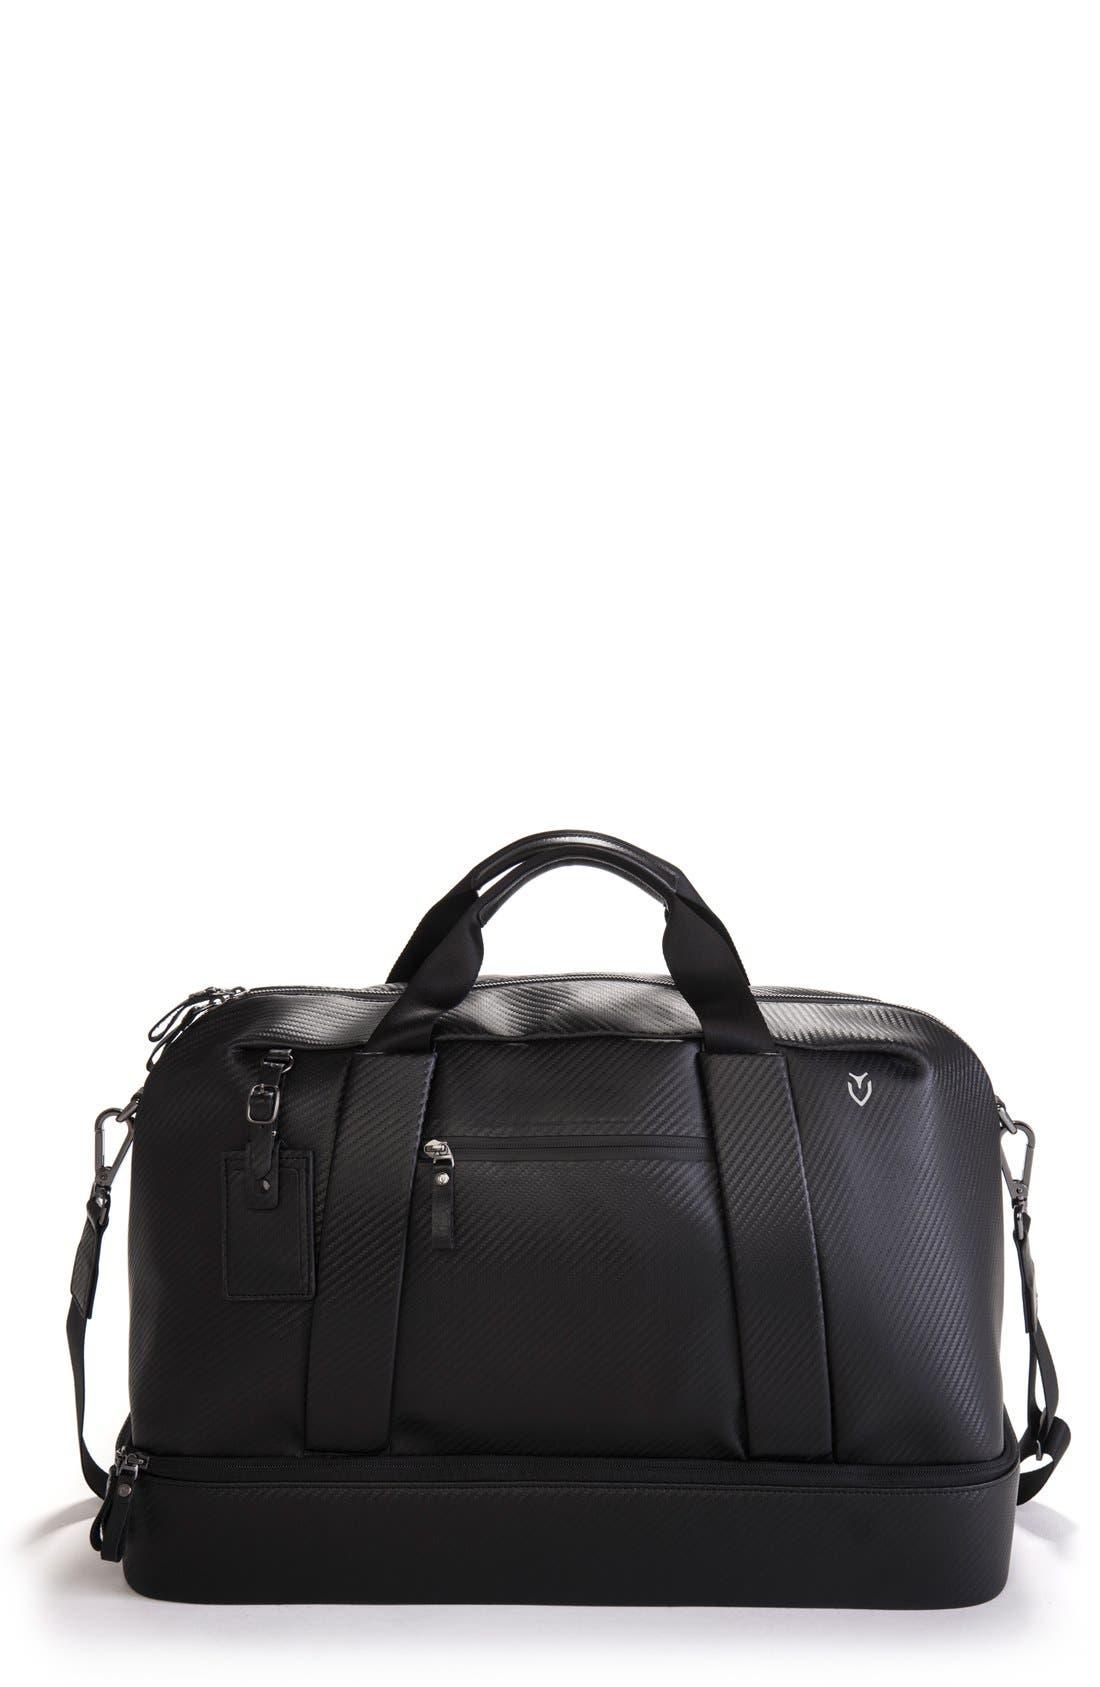 VESSEL Signature Large Boston Duffel Bag